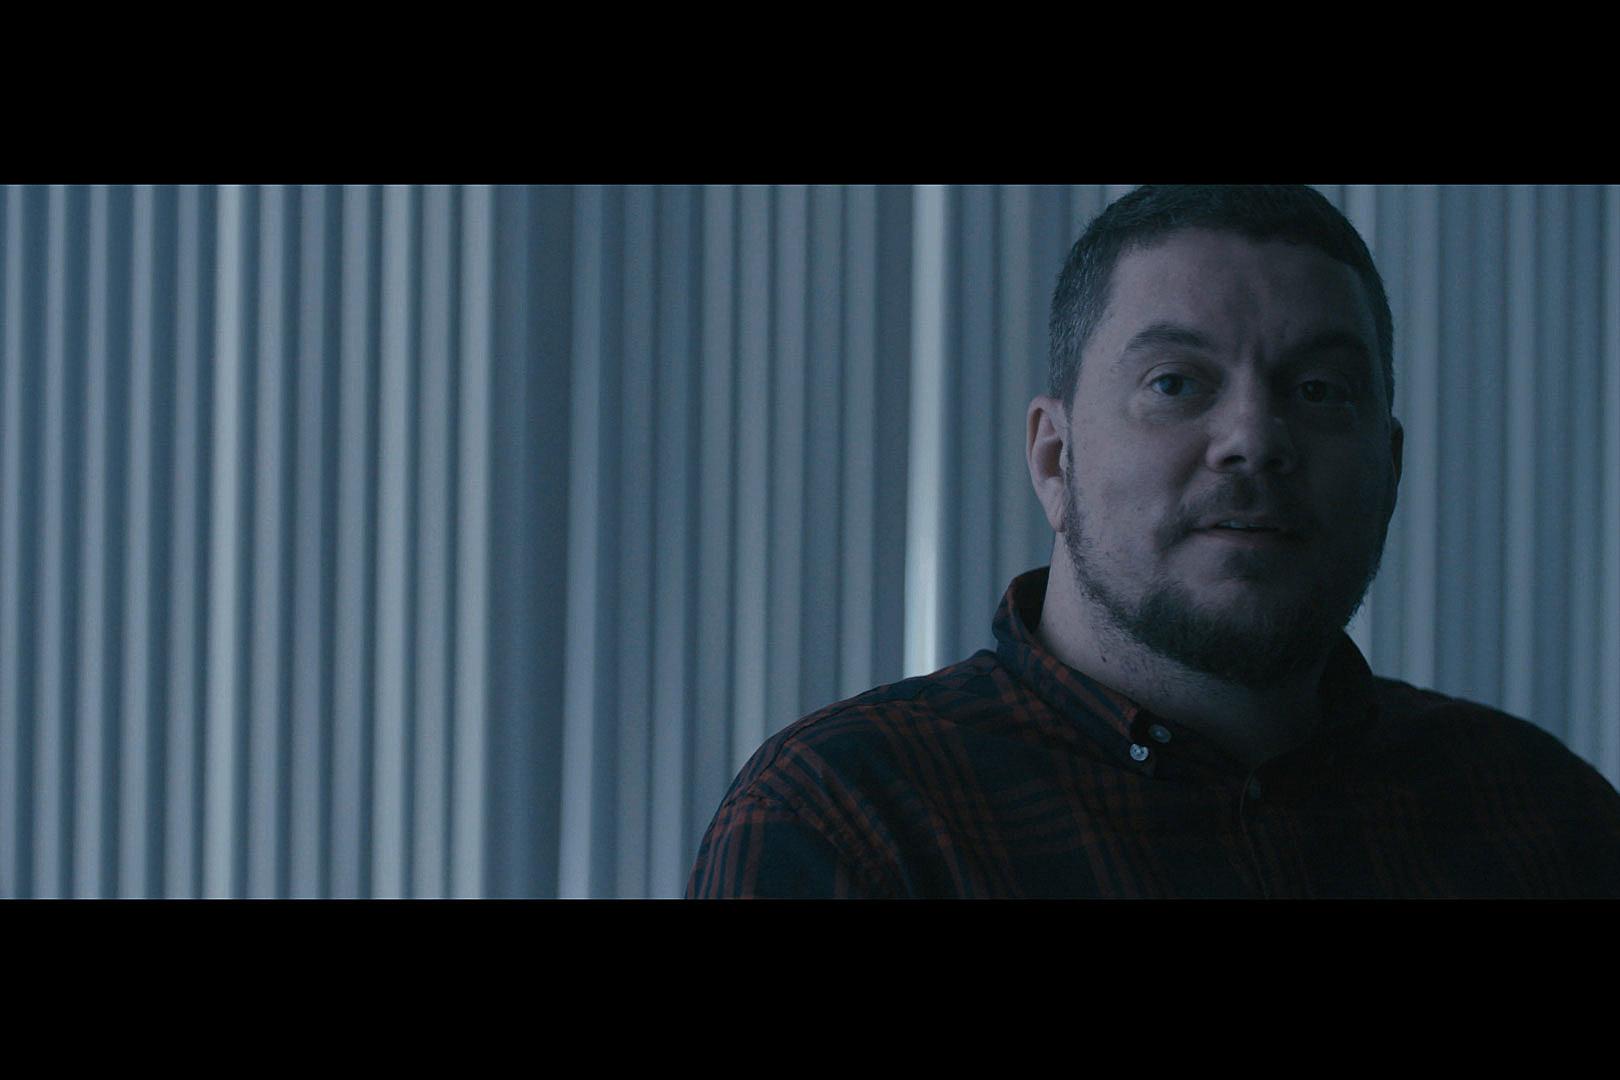 'Down Again' Explores Mental Illness Via a Metal Frontman